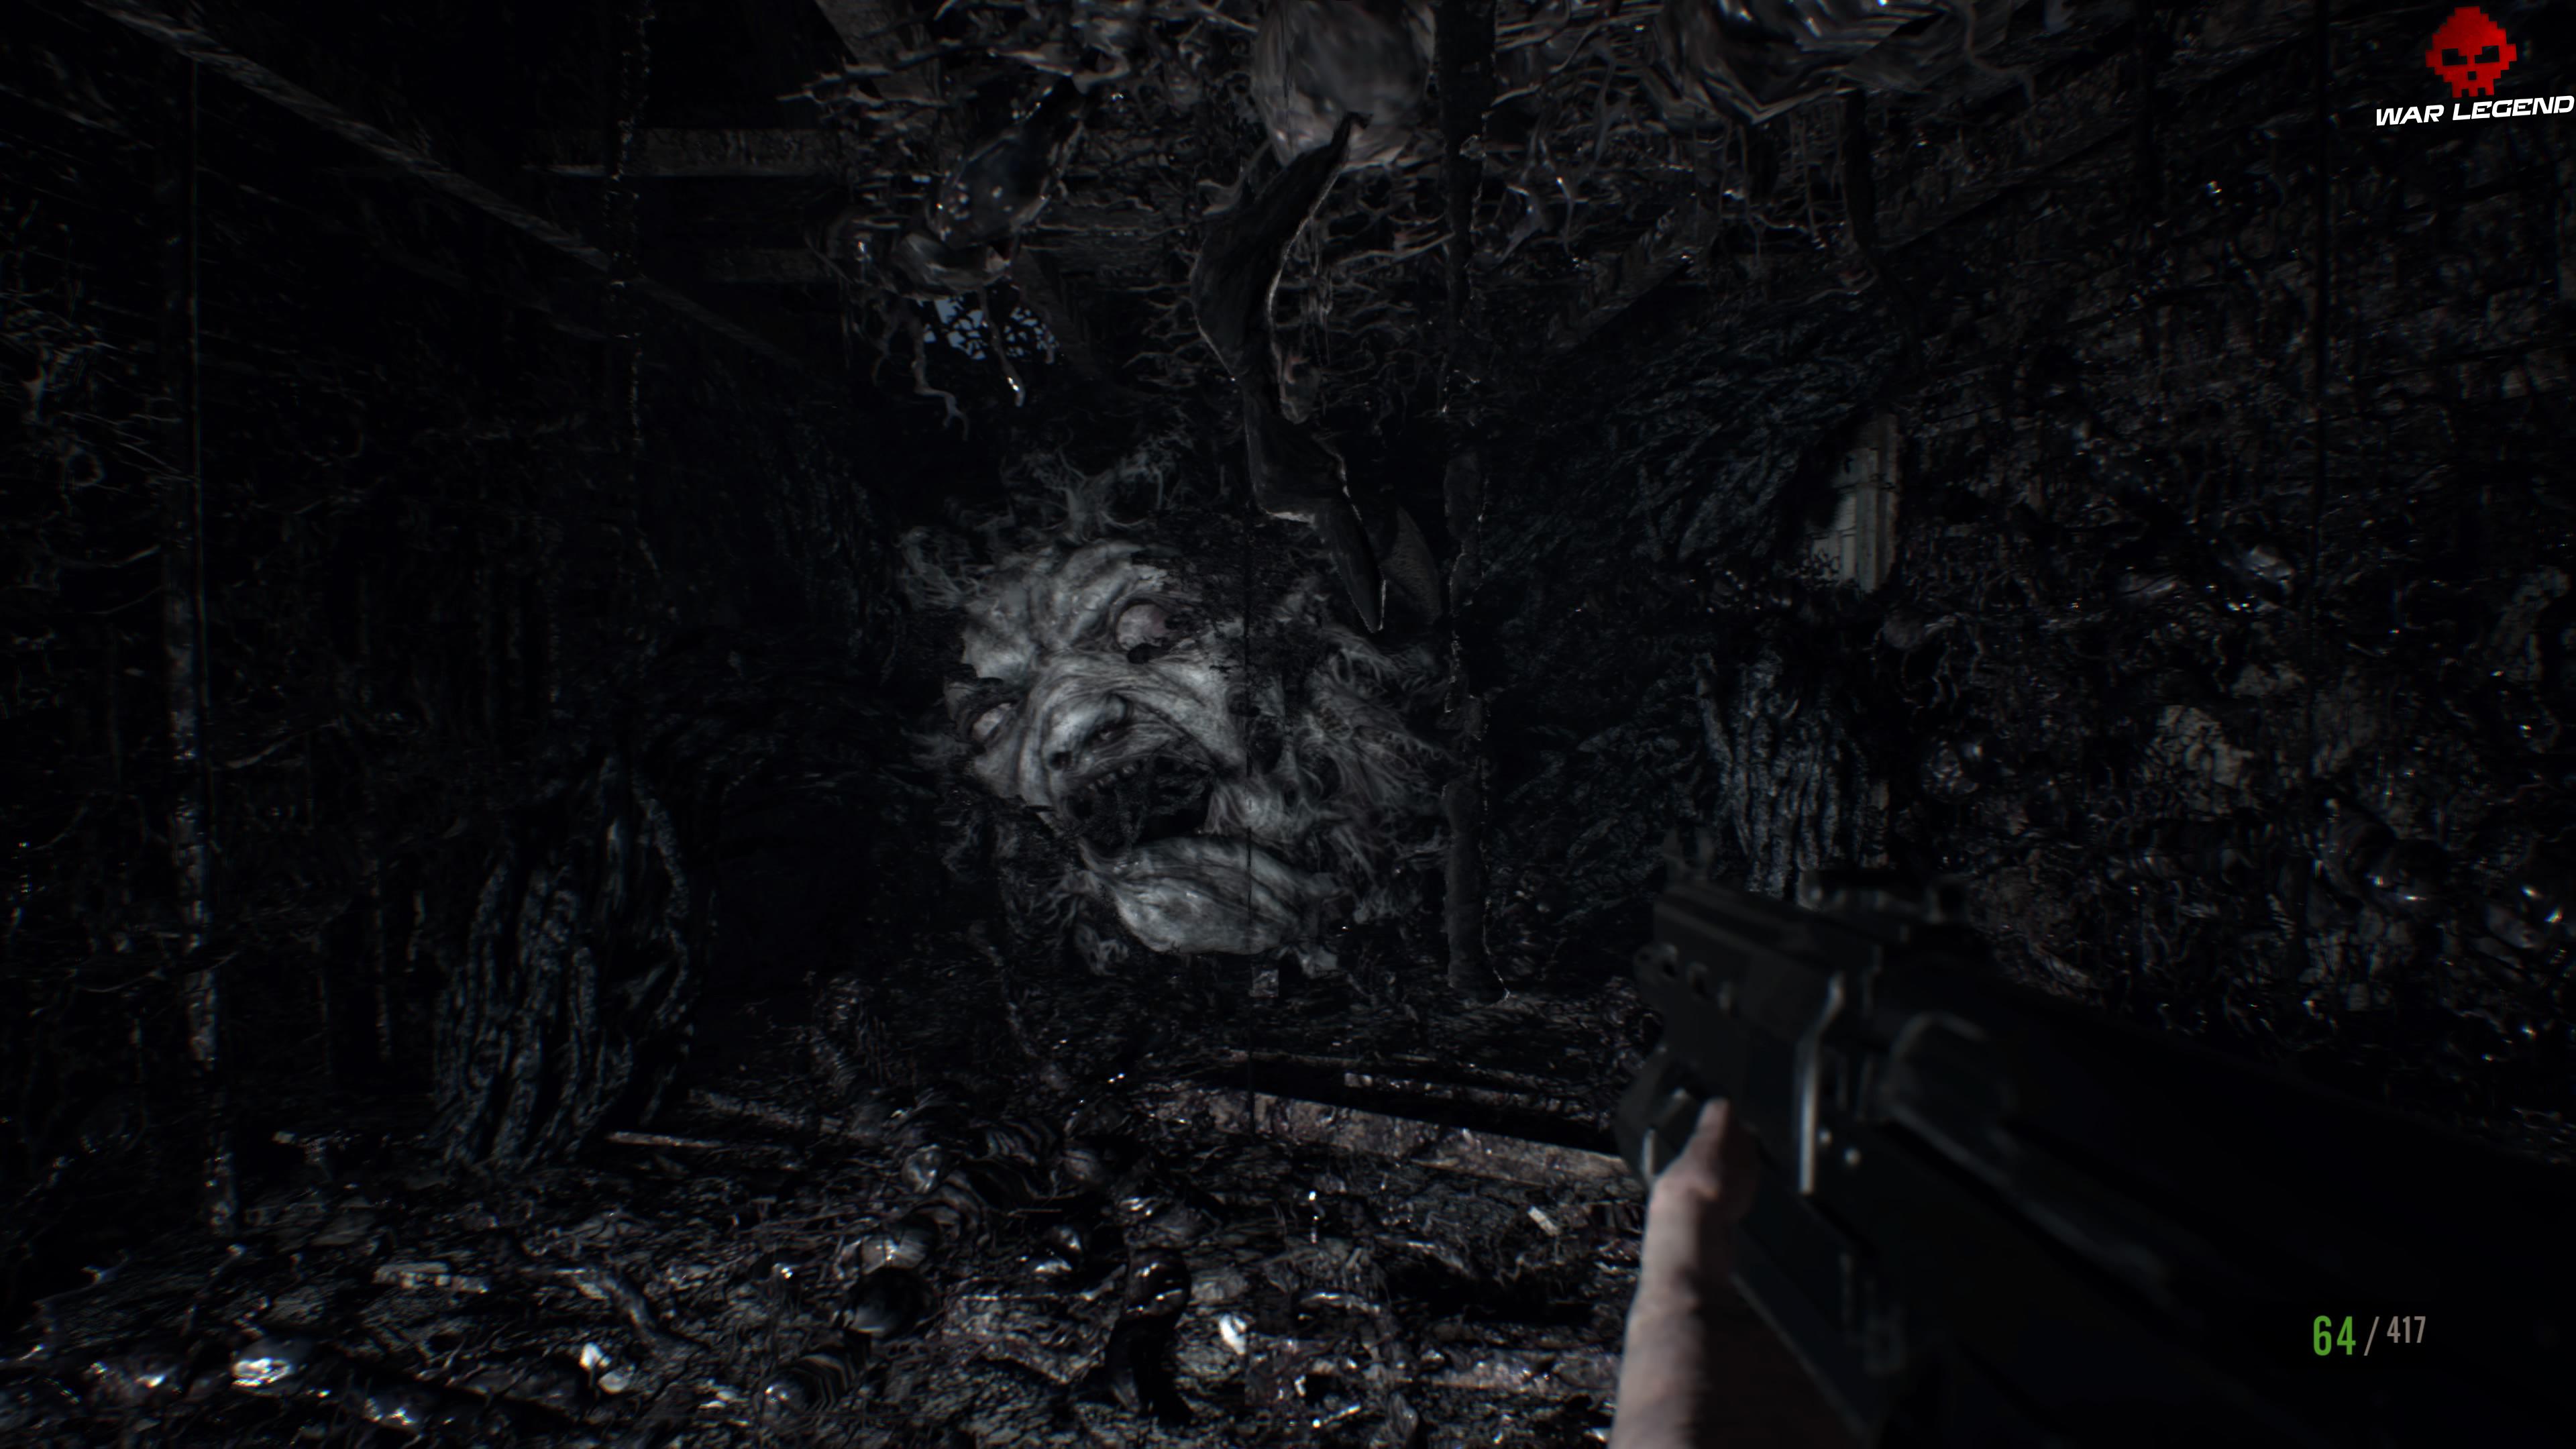 Solution Resident Evil 7 Biohazard - Chapitre 9 visage monstrueux Eveline